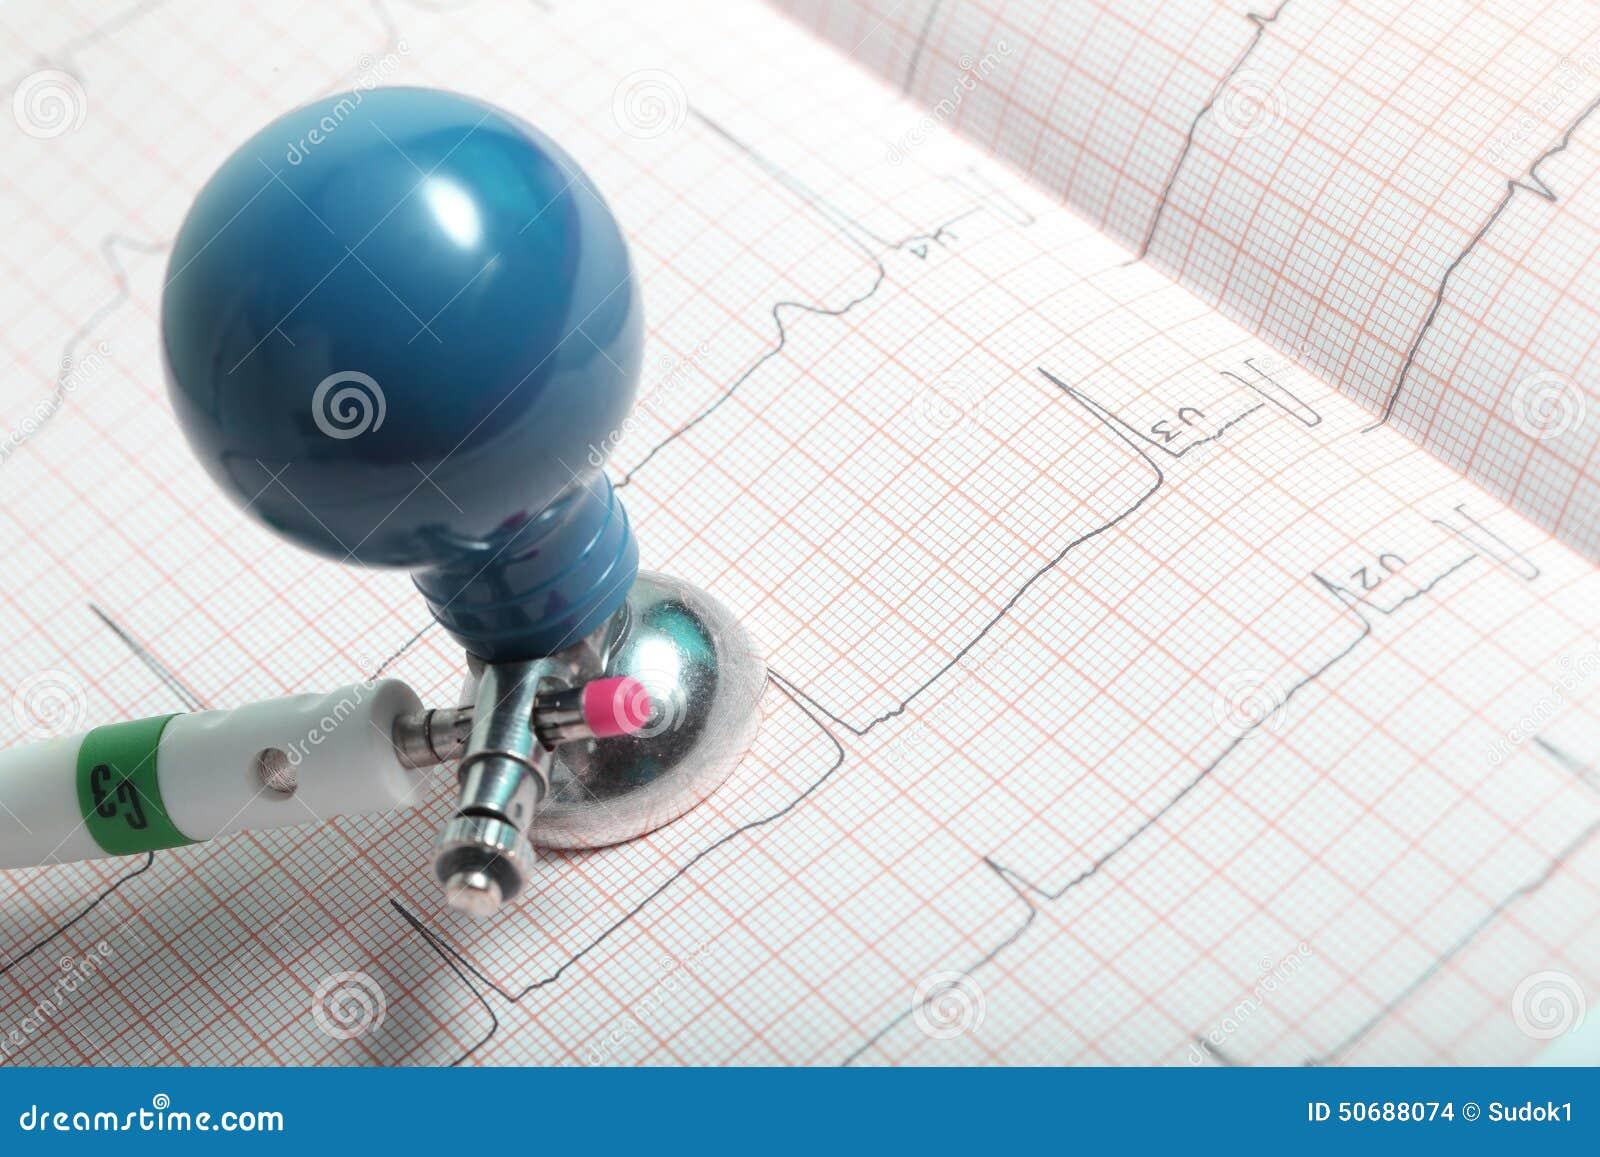 electrode and ecg chart closeup stock photo image 50688074. Black Bedroom Furniture Sets. Home Design Ideas